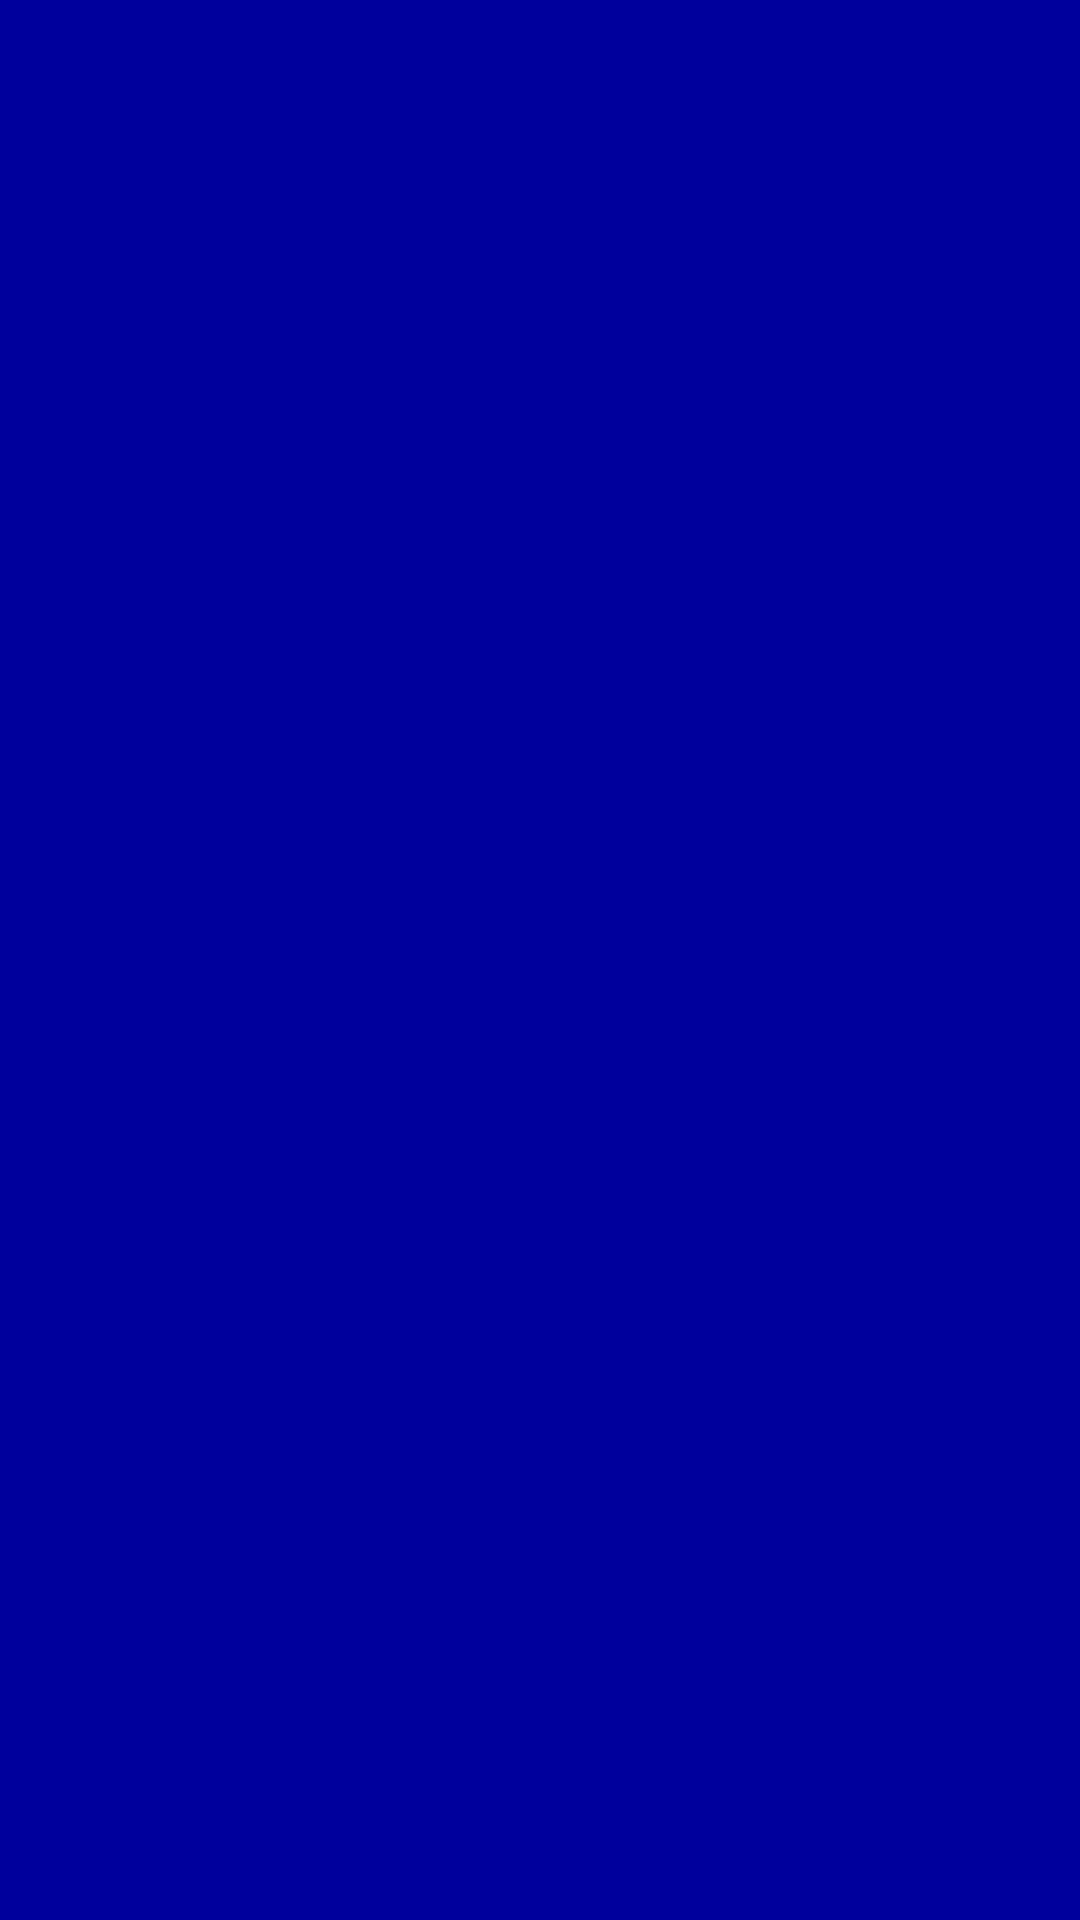 1080x1920 Duke Blue Solid Color Background